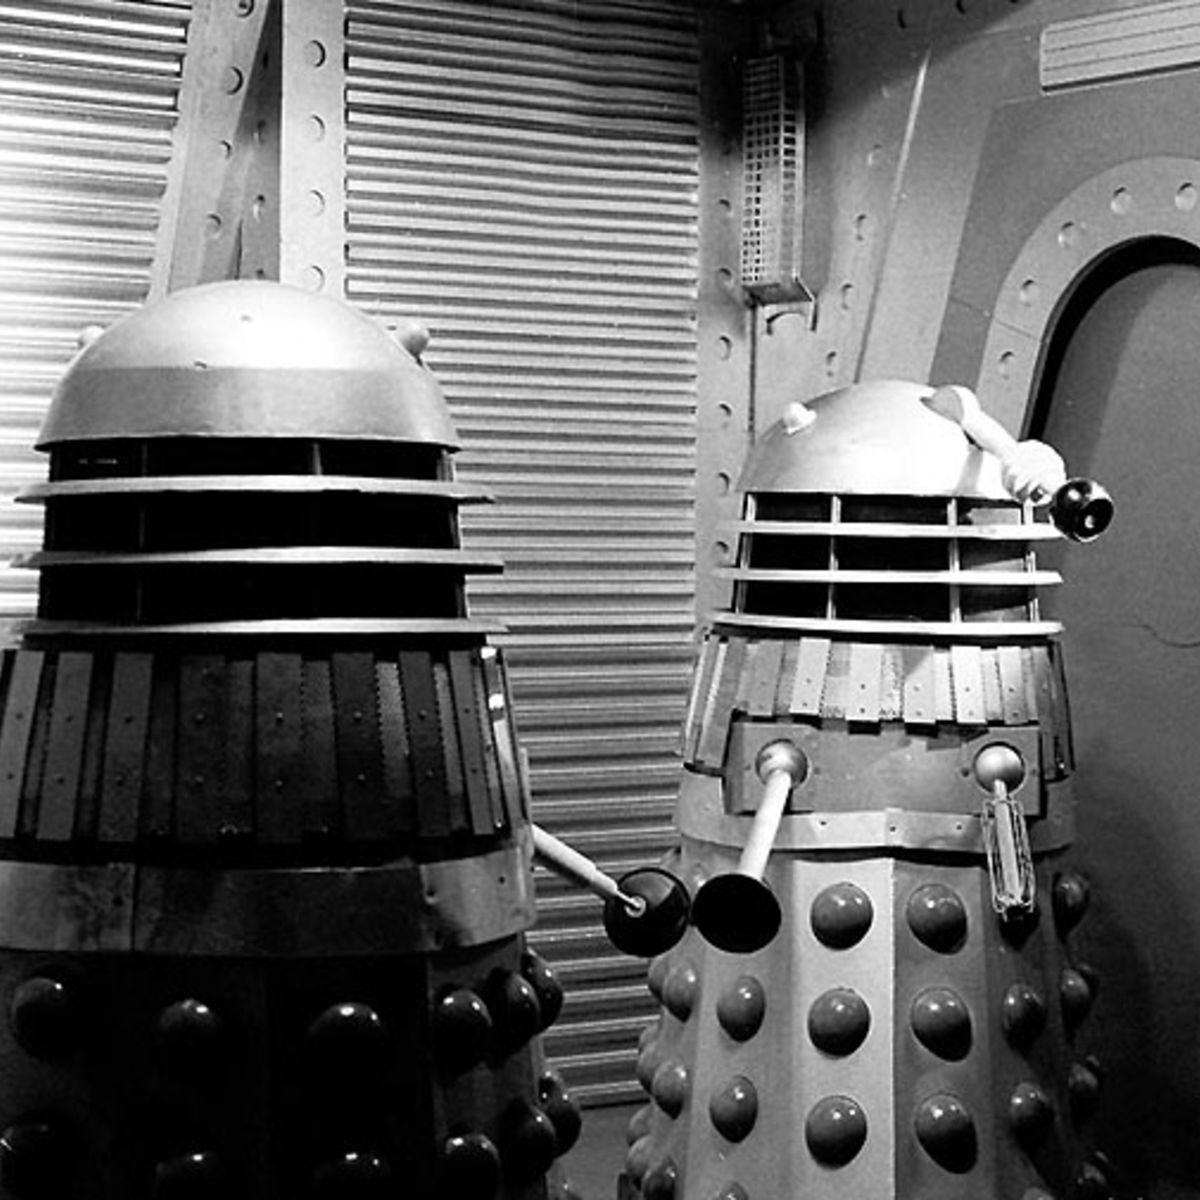 Doctor_Who-_The_Power_of_the_Daleks_Daleks_c_BBC_BBC_AMERICA_0.jpg